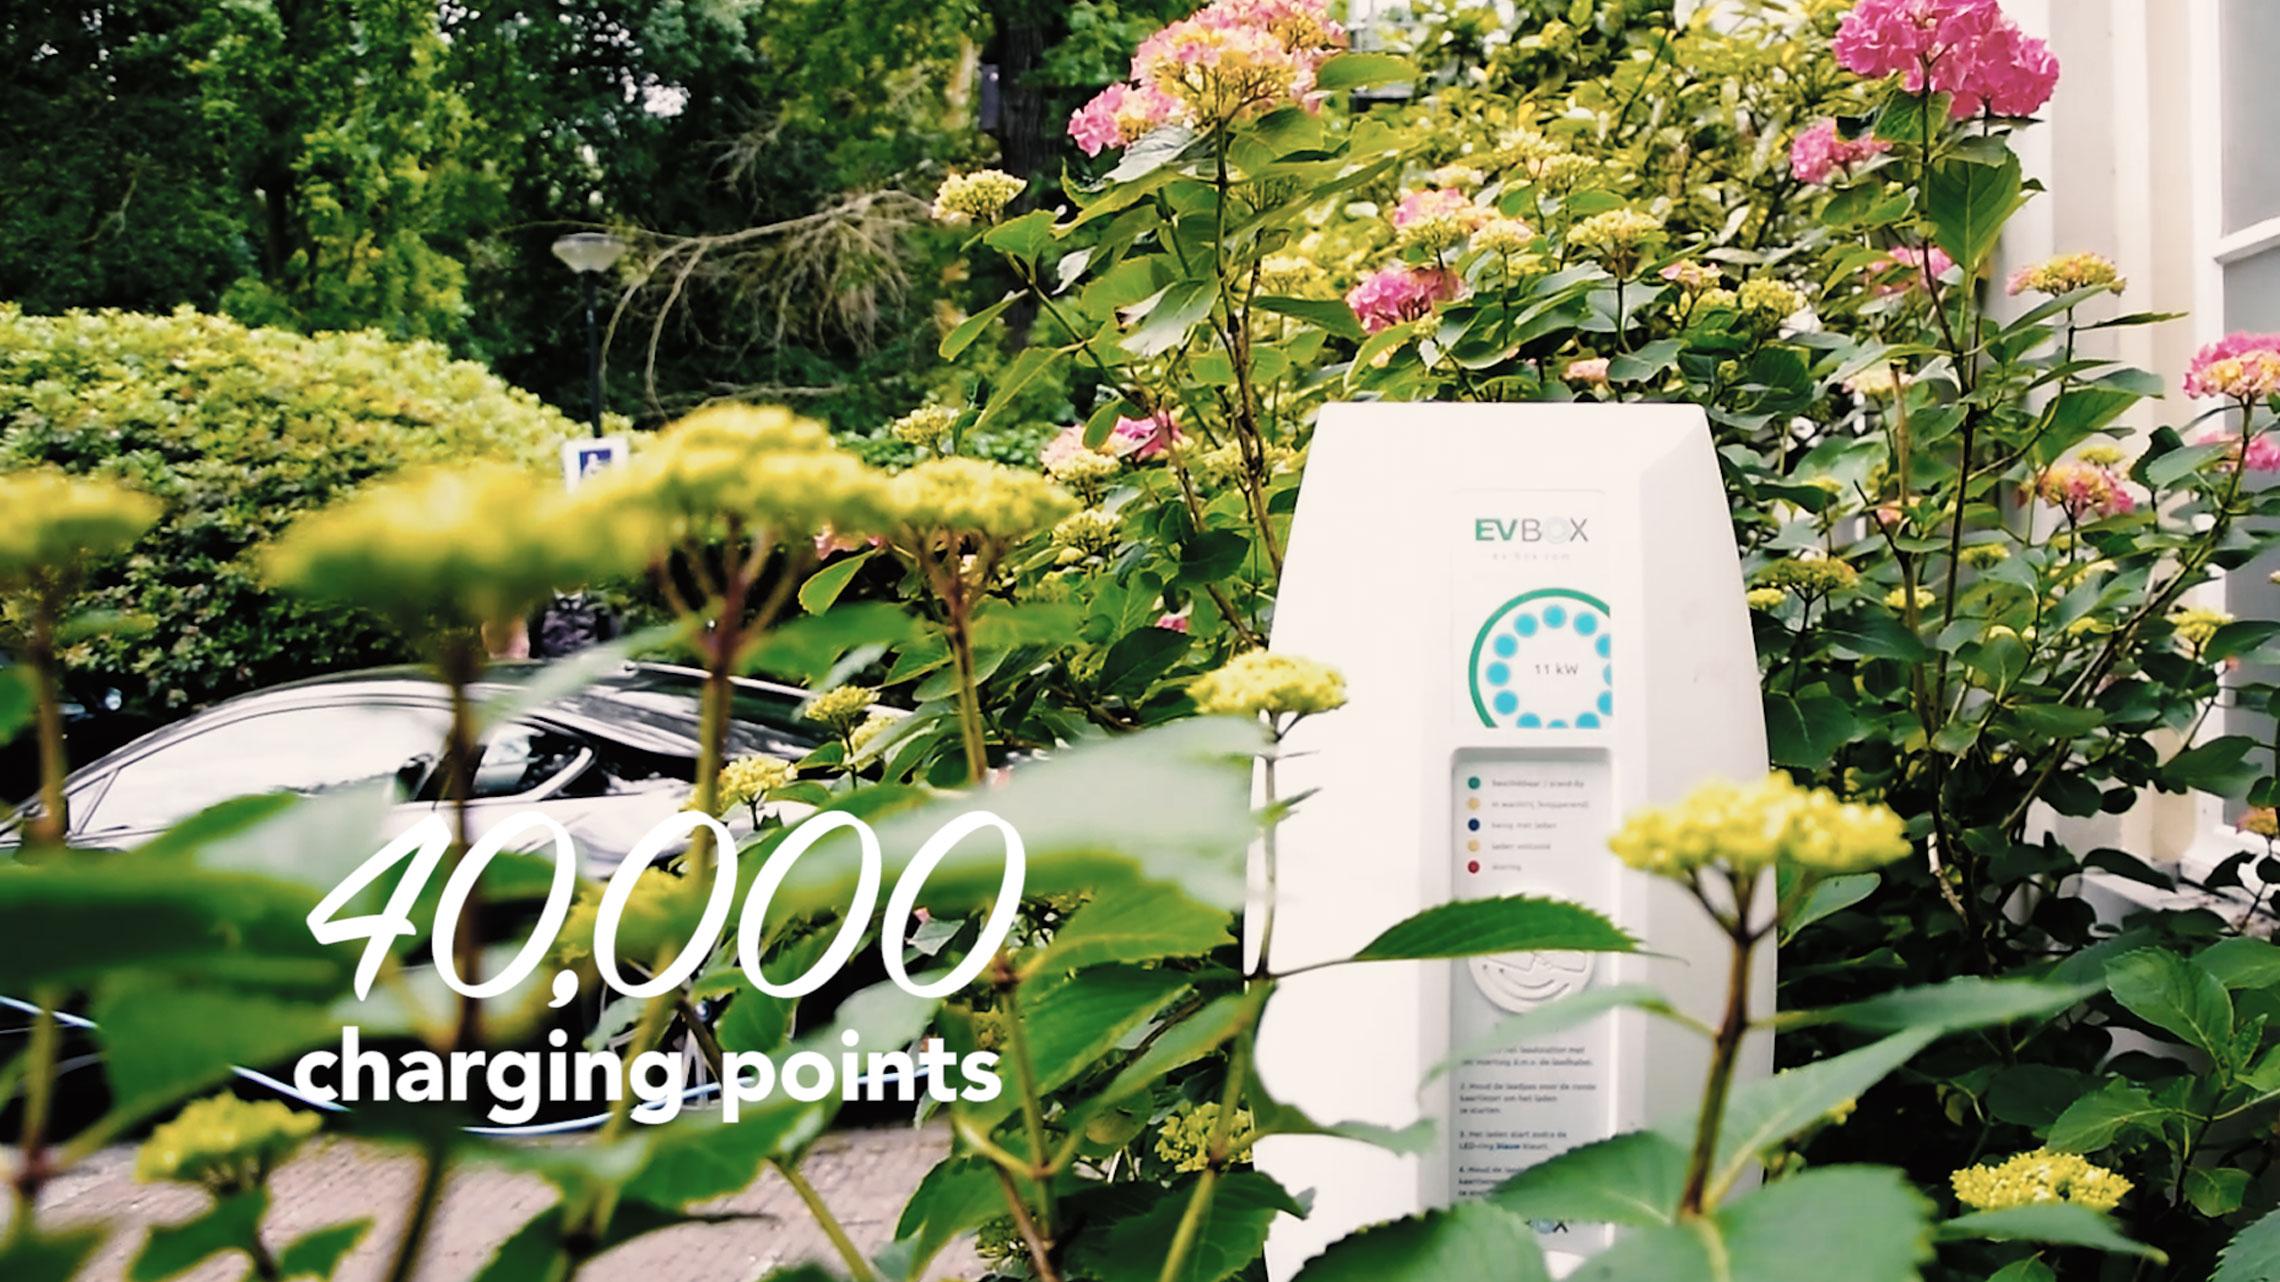 40k-chargingpoints